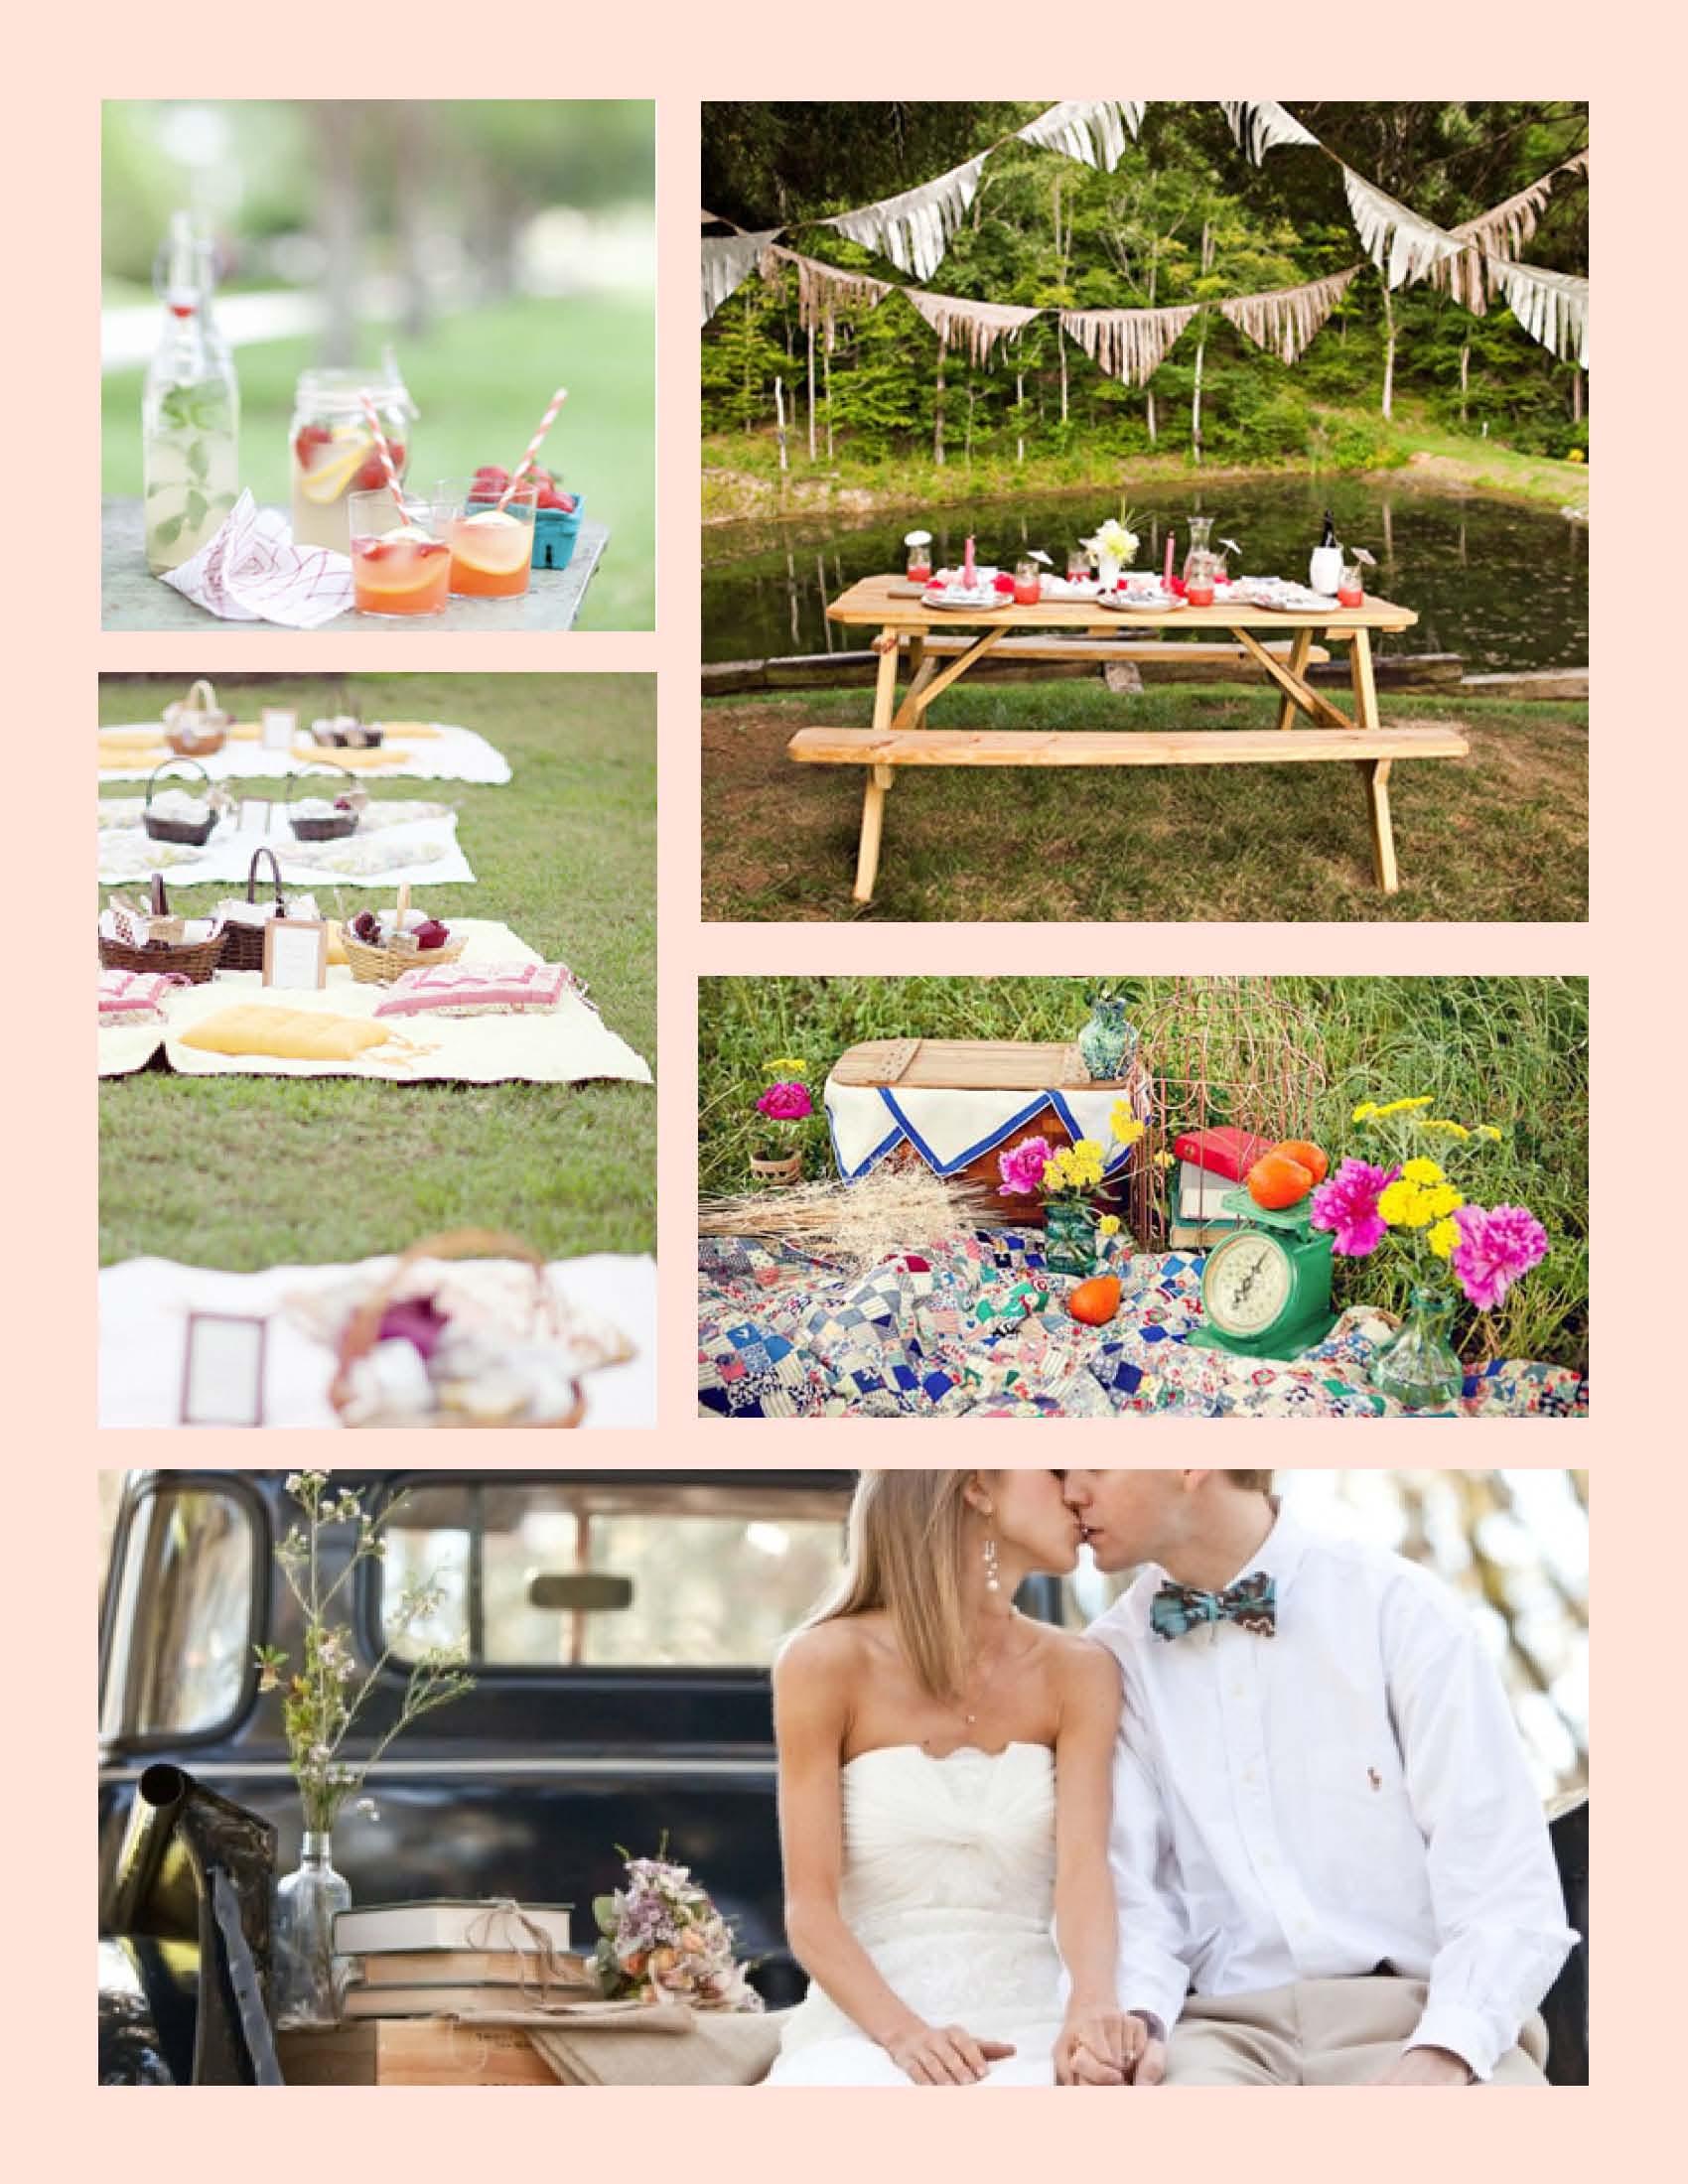 Picnic Themed Wedding